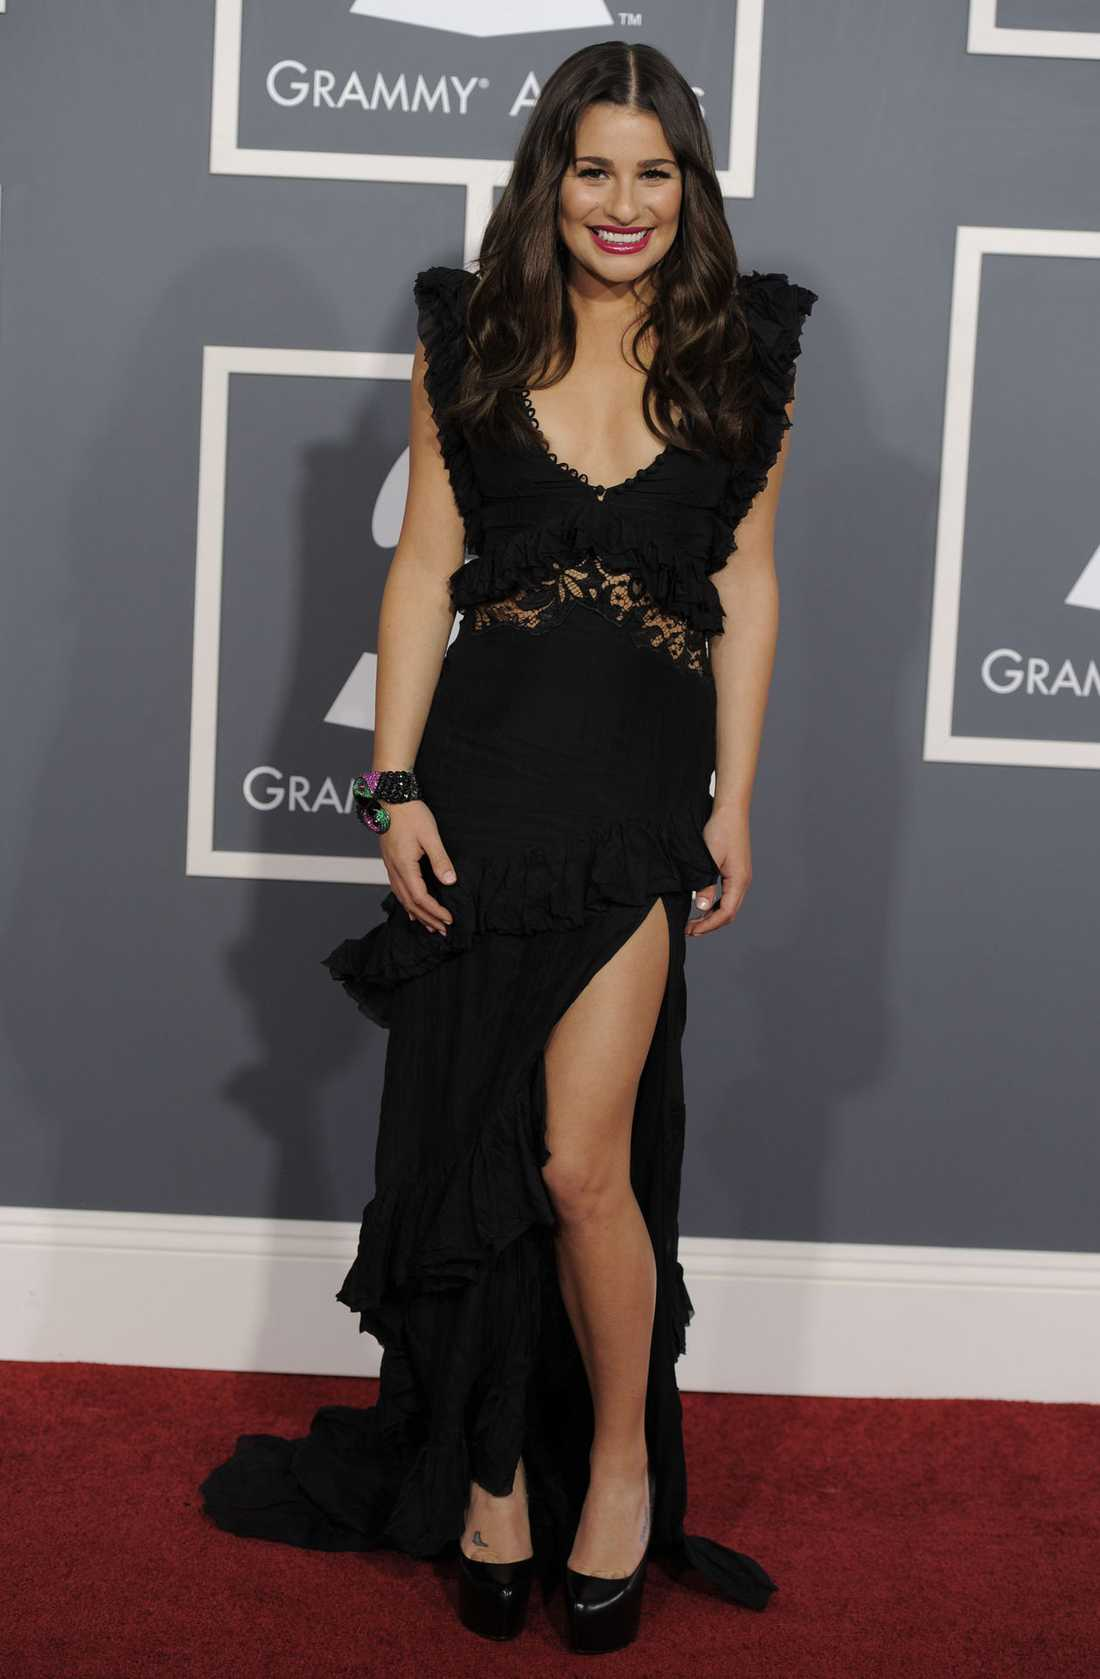 Lea Michele var söt i klänning från Emilio Pucci.